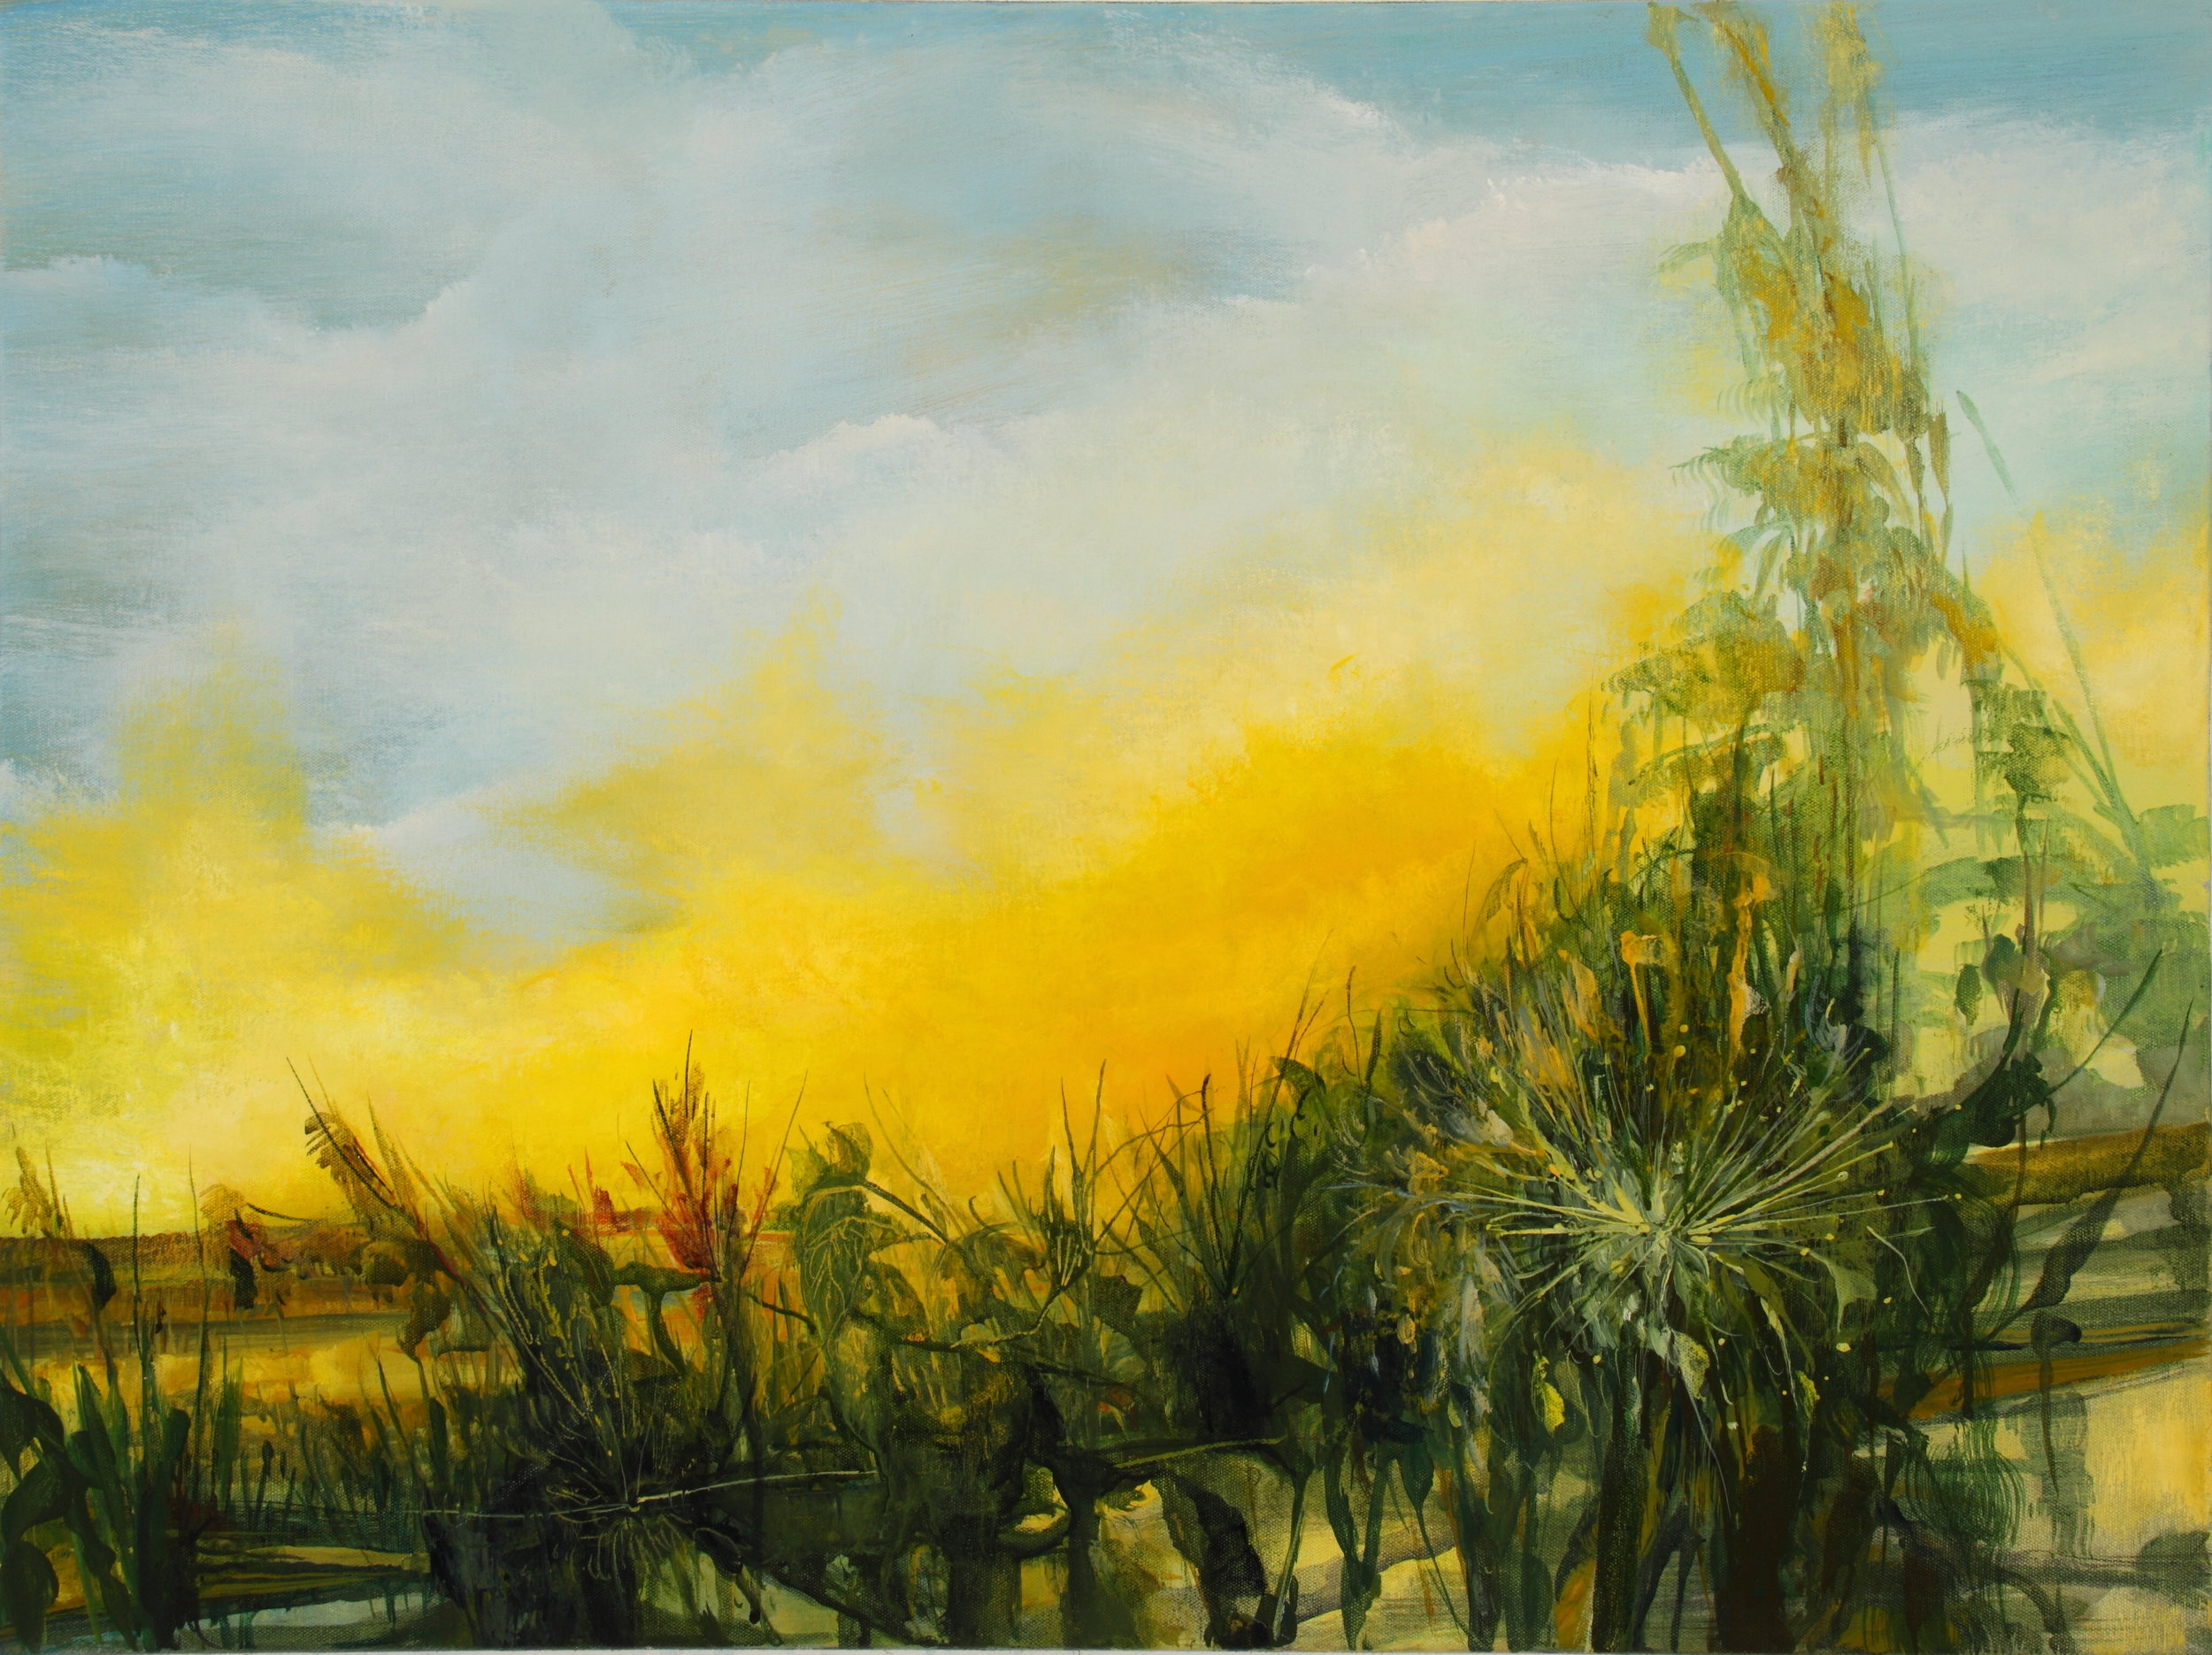 Elementary Geography Sunrise, 2010, 24 x 32 inches, acrylic on canvas